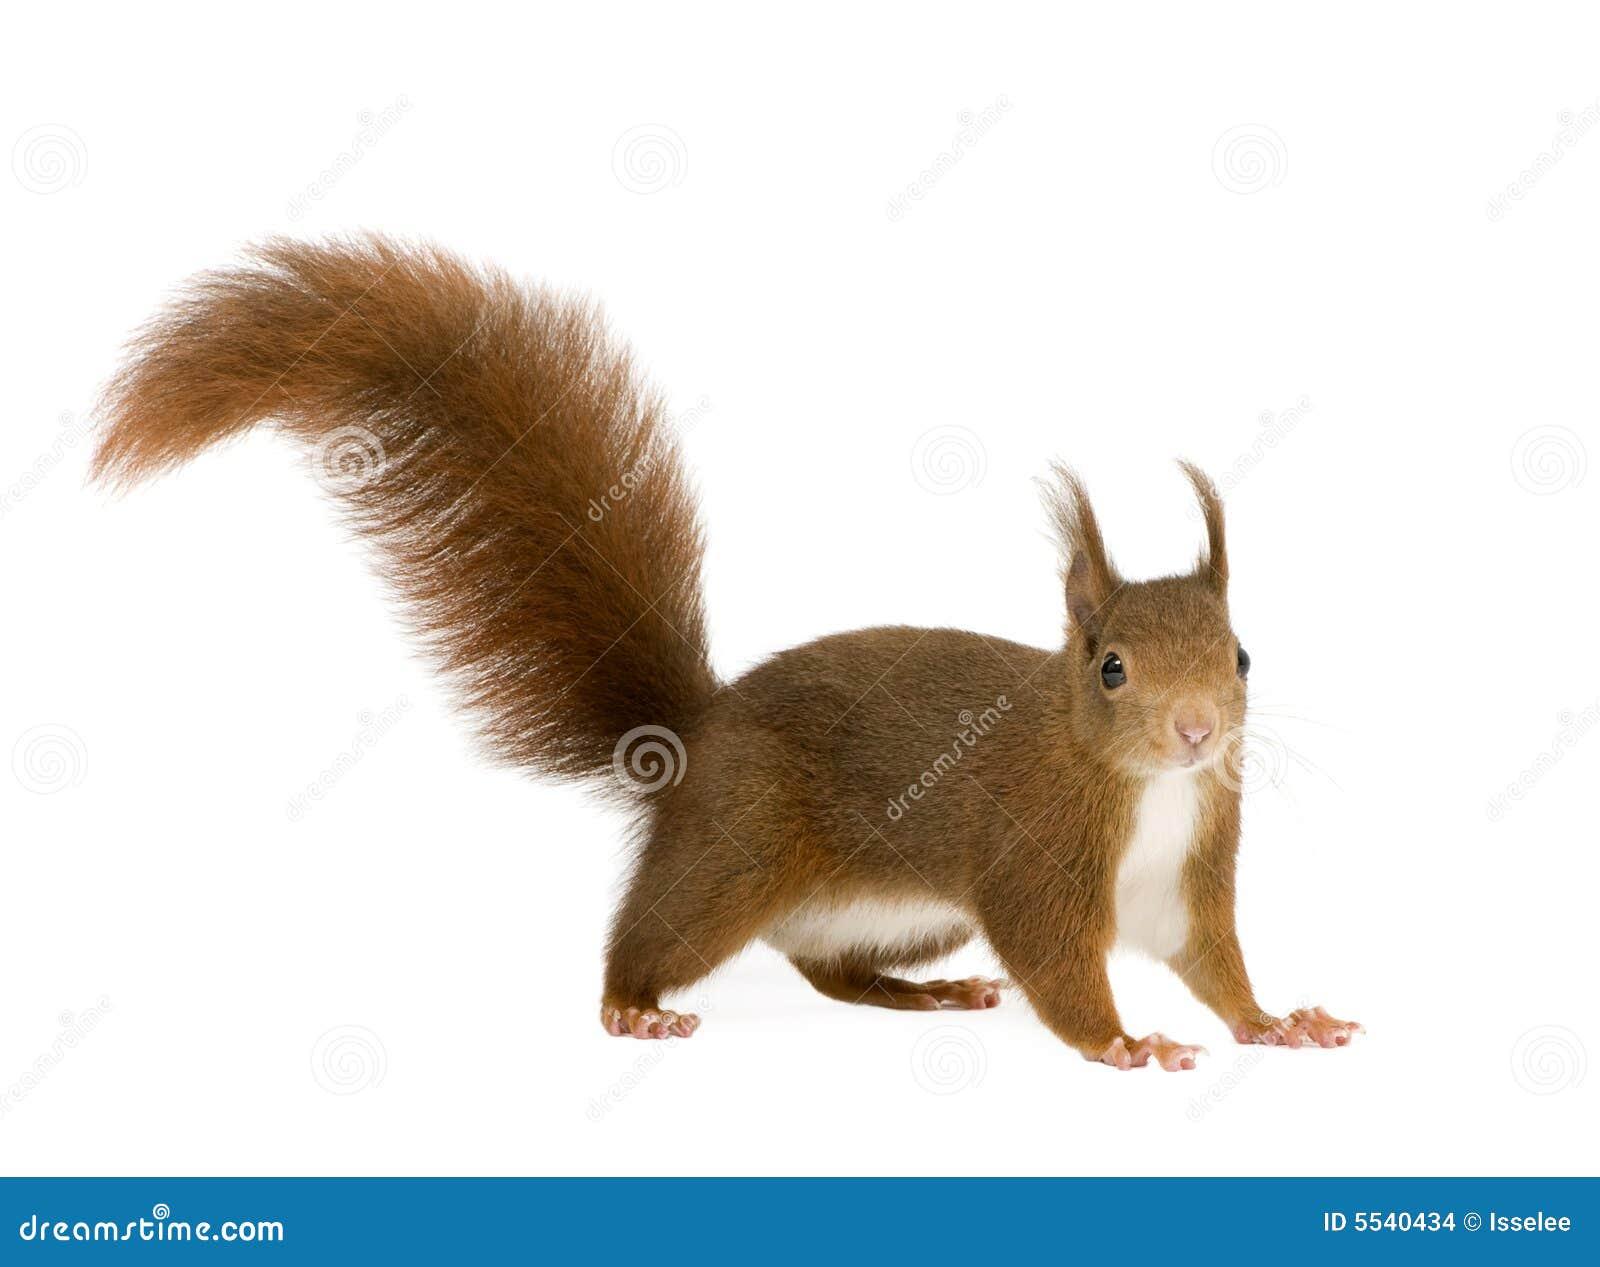 Écureuil rouge eurasien - Sciurus vulgaris (2 ans)